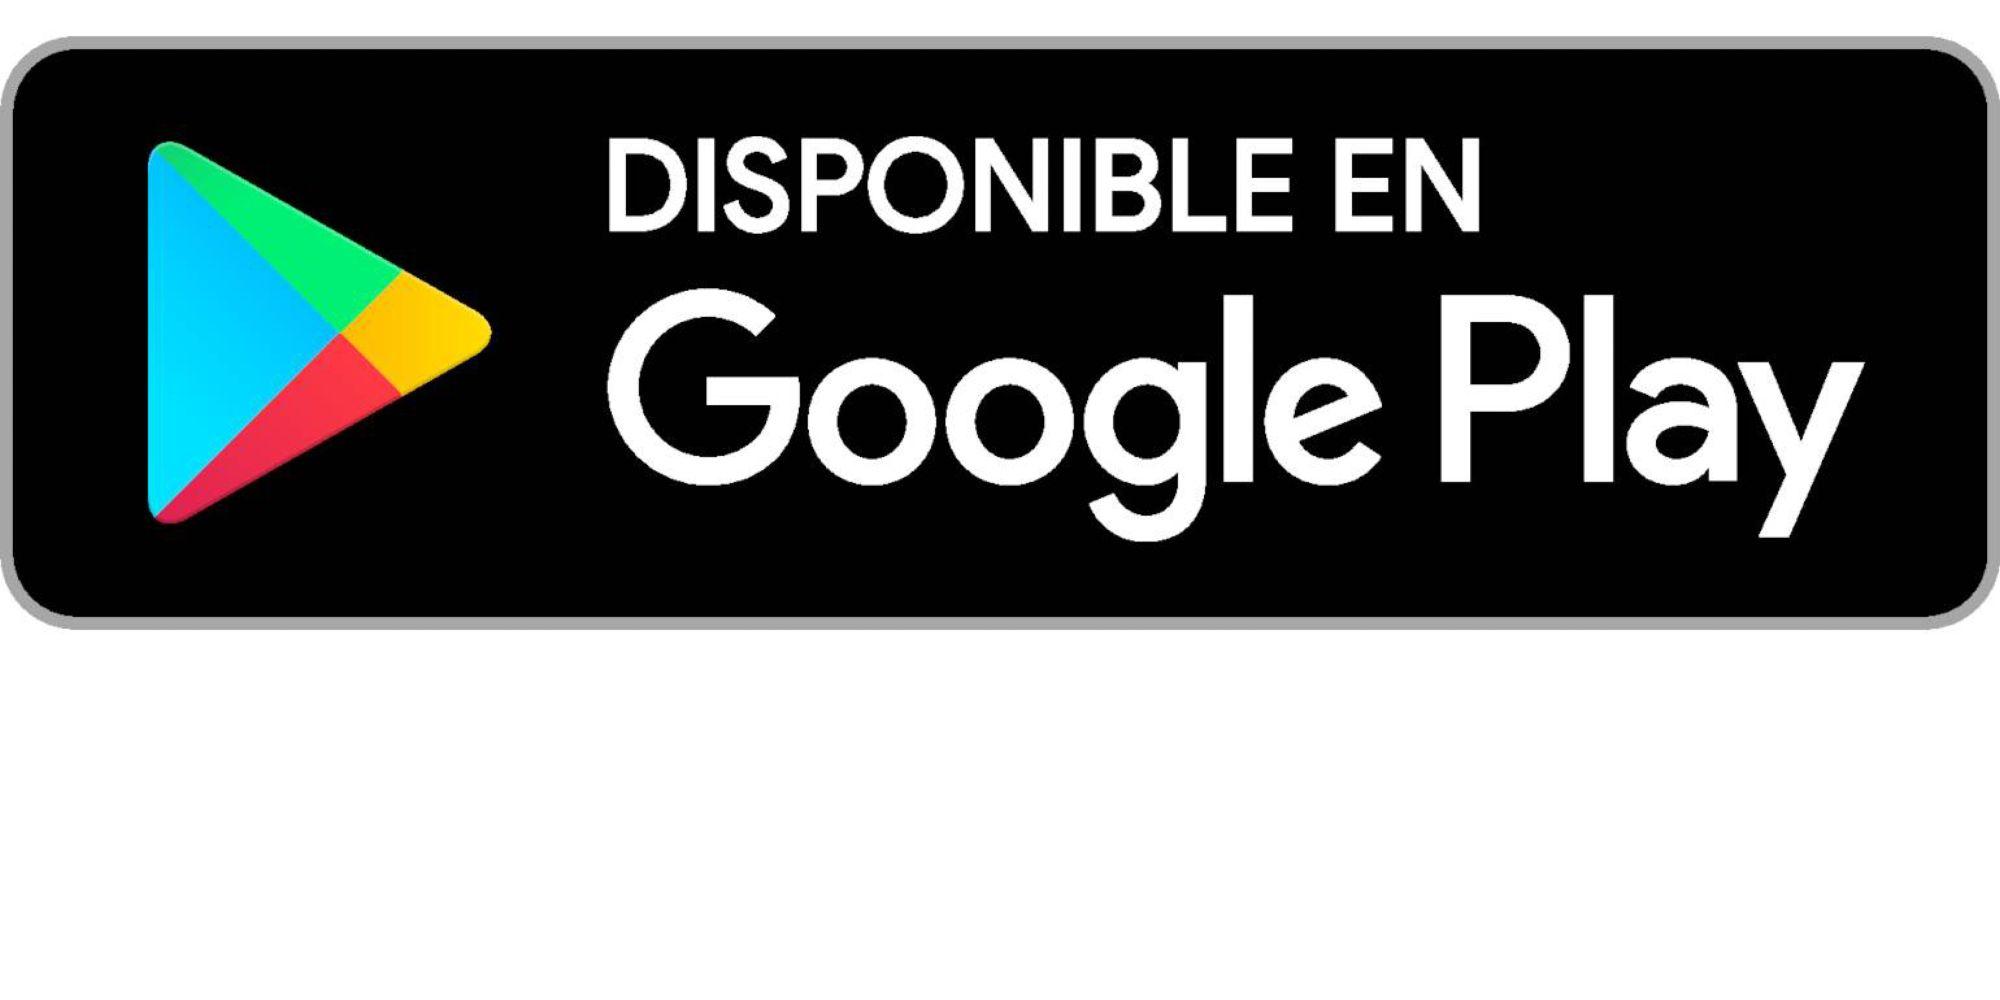 google-play-badge-ES-1540x770.jpg